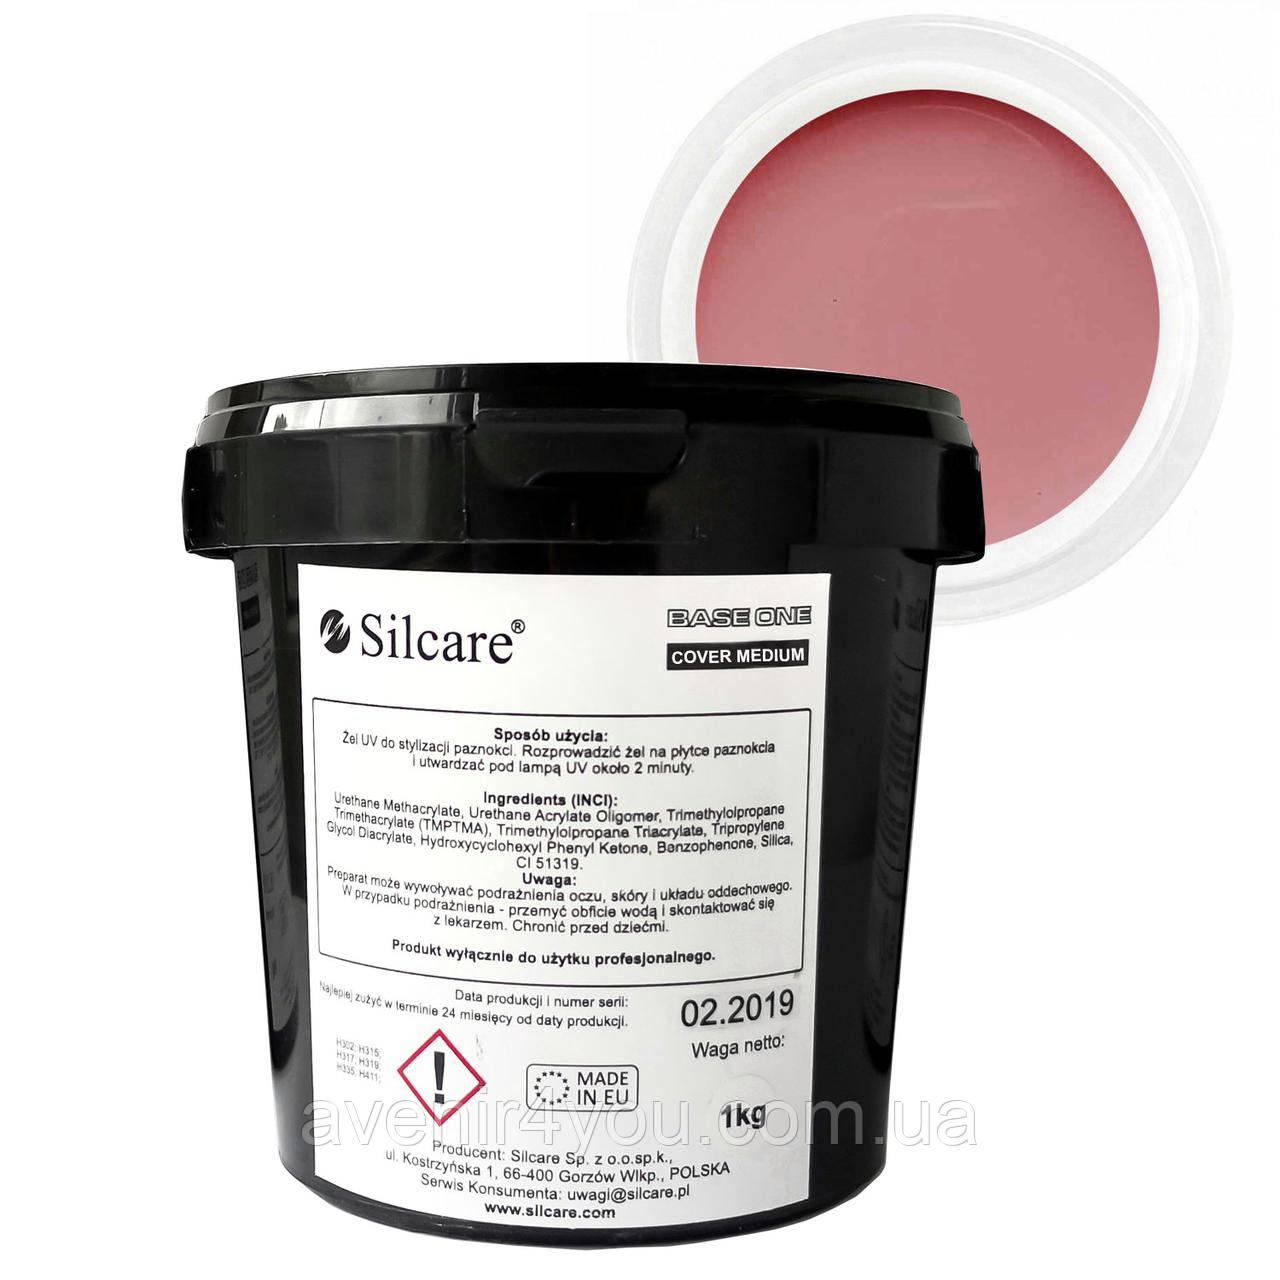 Гель Silcare Силкар Сover Medium Base One, 1 кг ОПТ